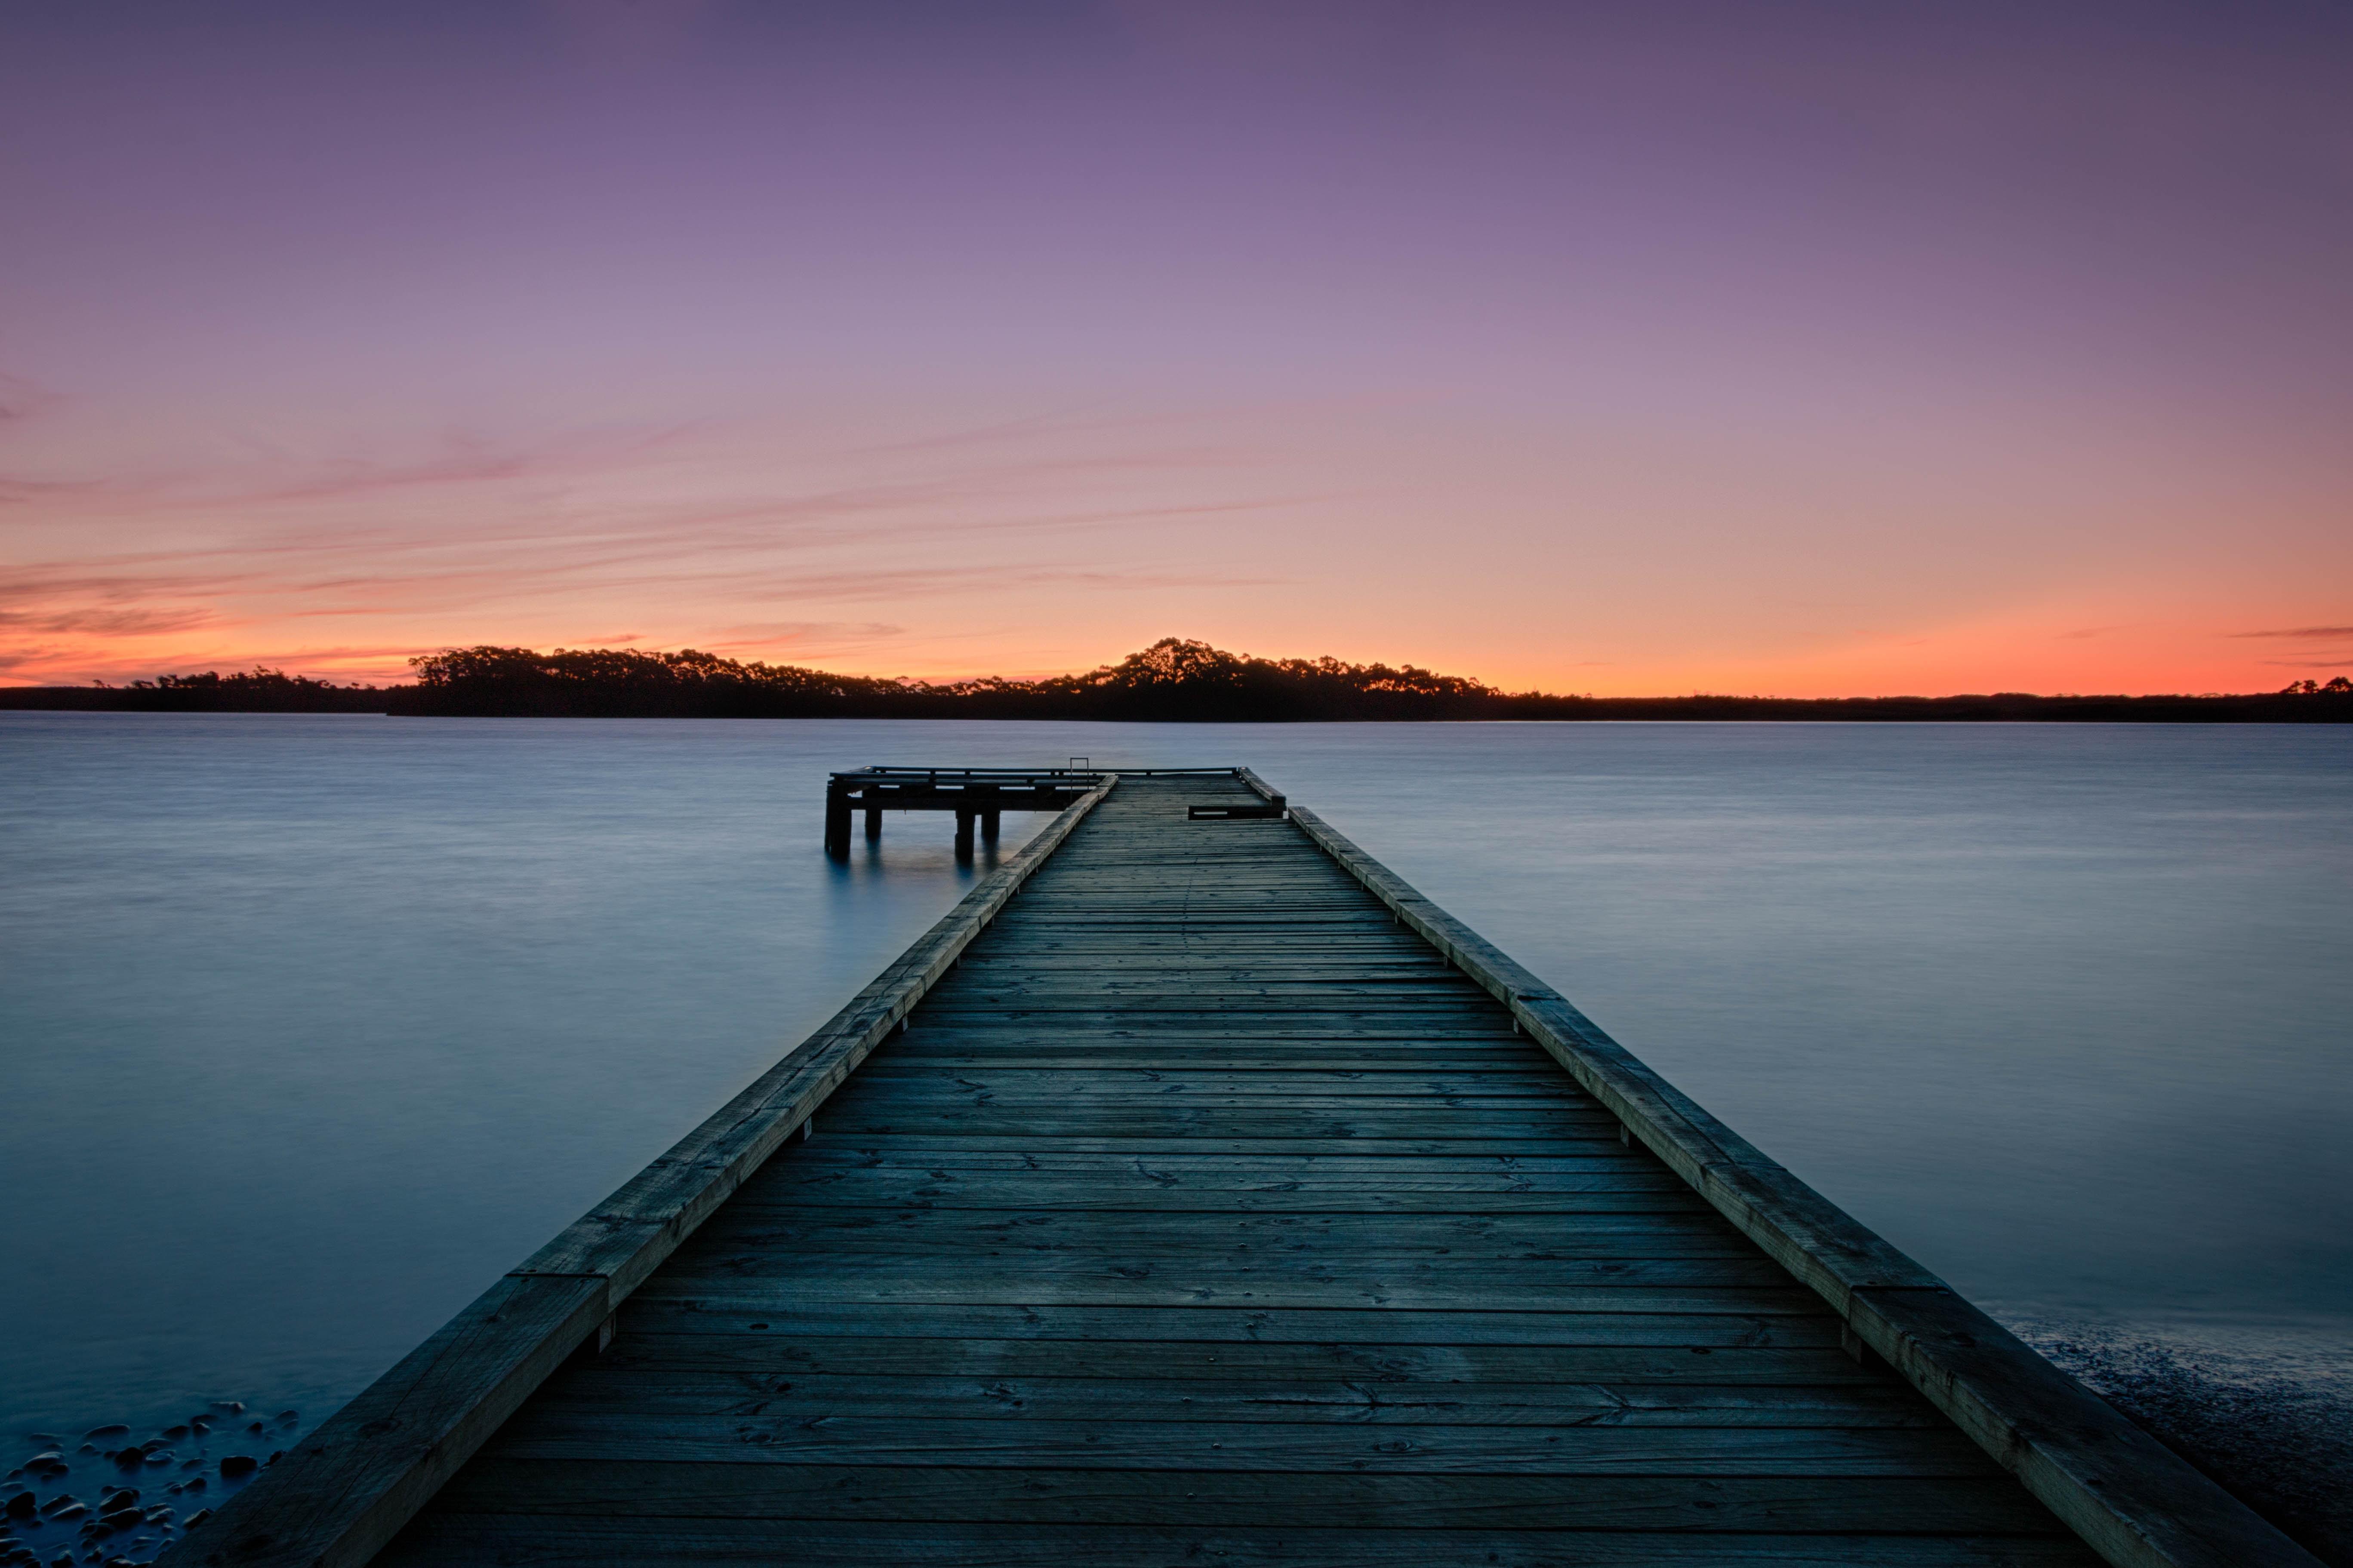 Long exposure sunset by the pier in Strahan, Tasmania, Australia